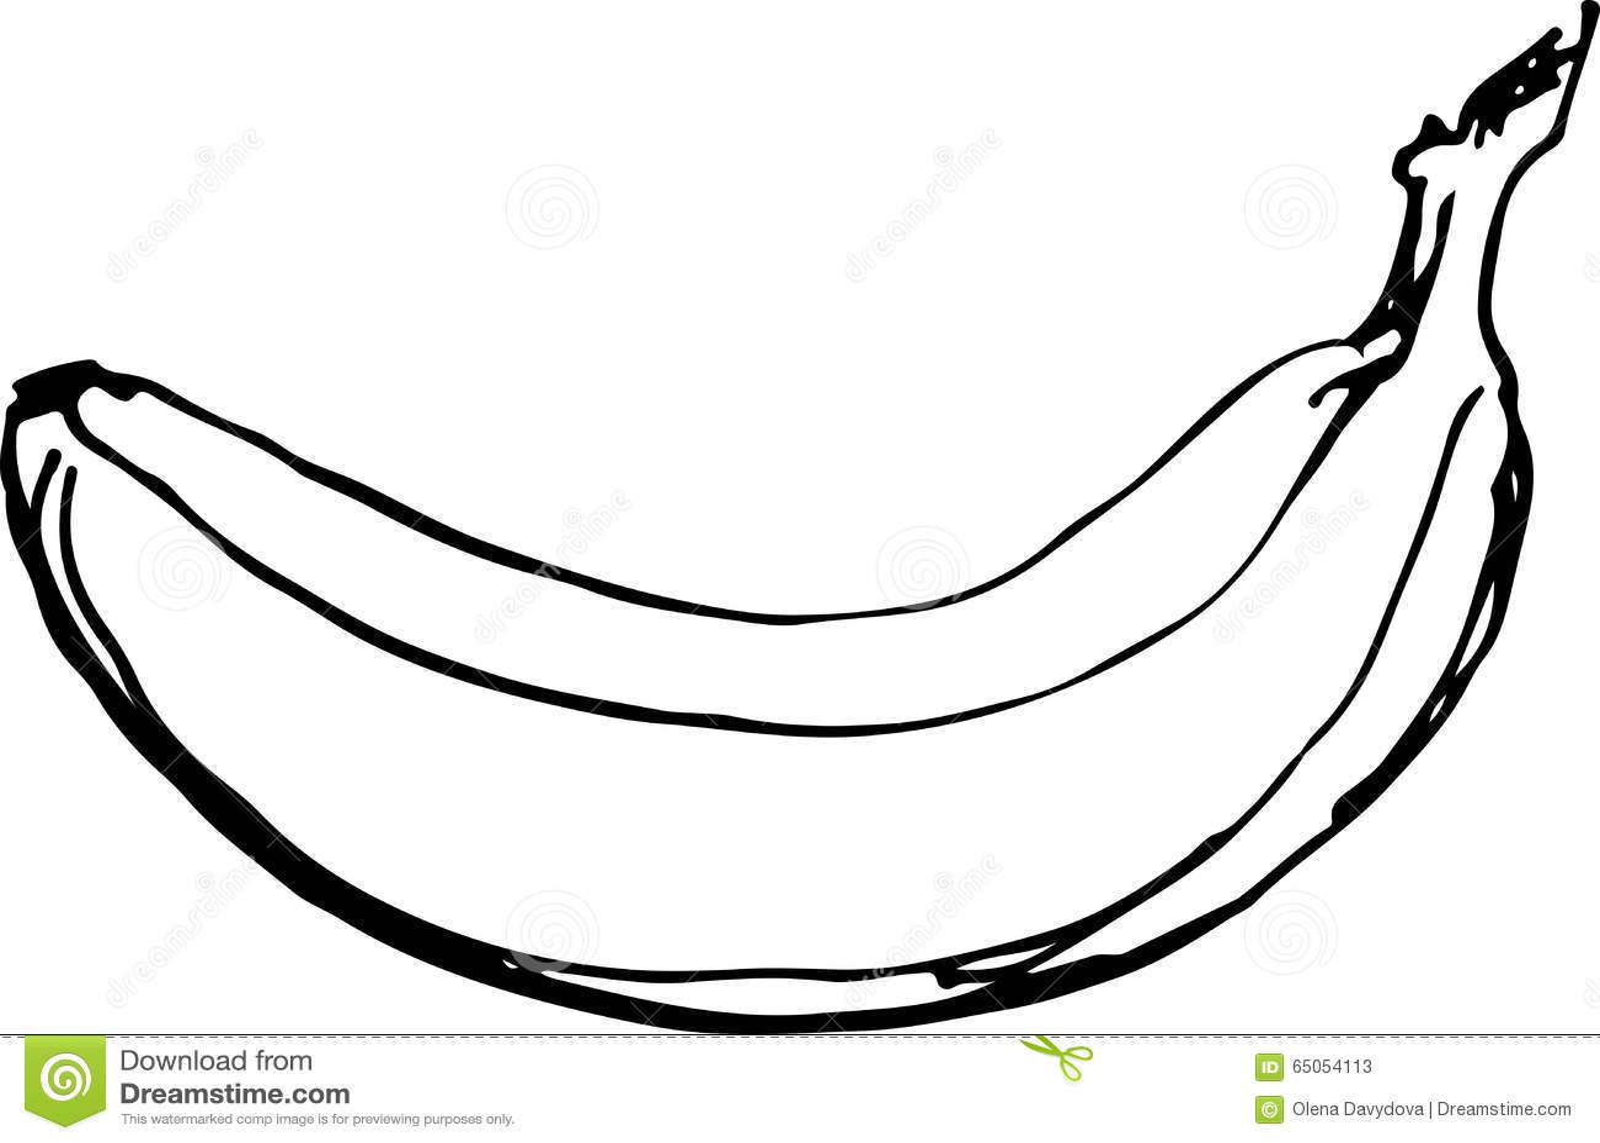 Banana Vector Illustration Stock Vector